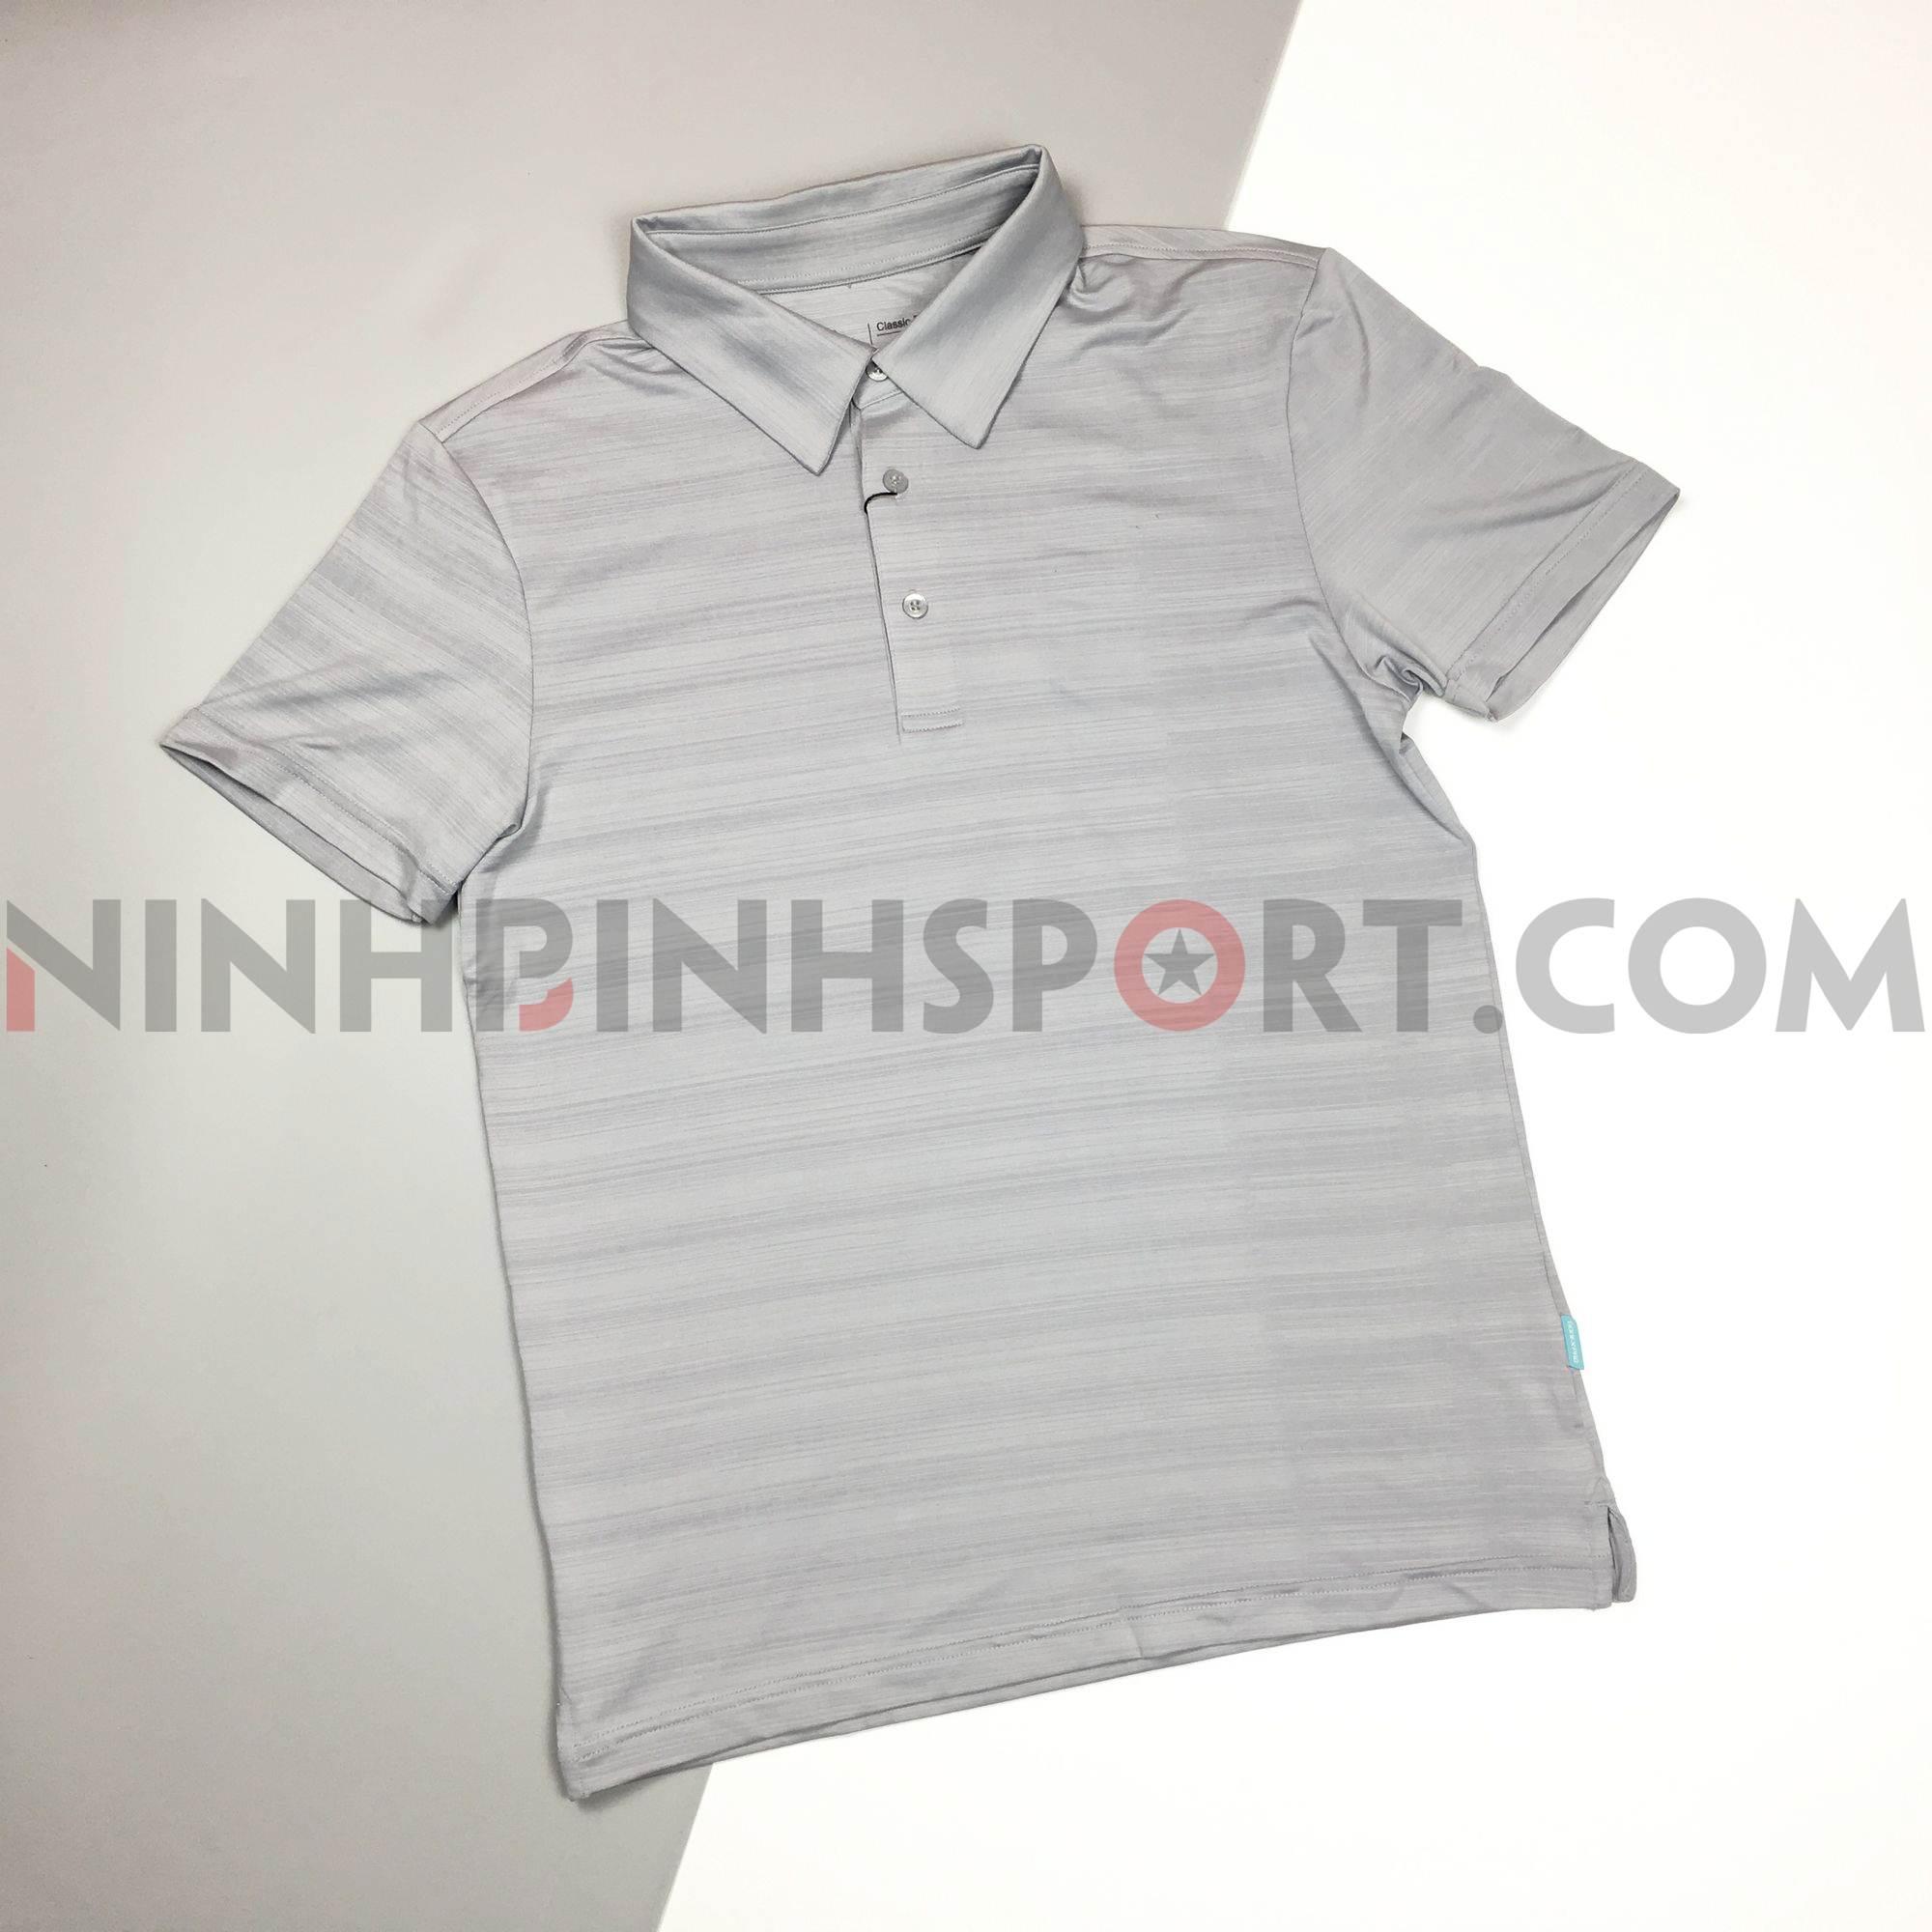 Áo thể thao nam Donex Golf Polo MC-9012-18-19